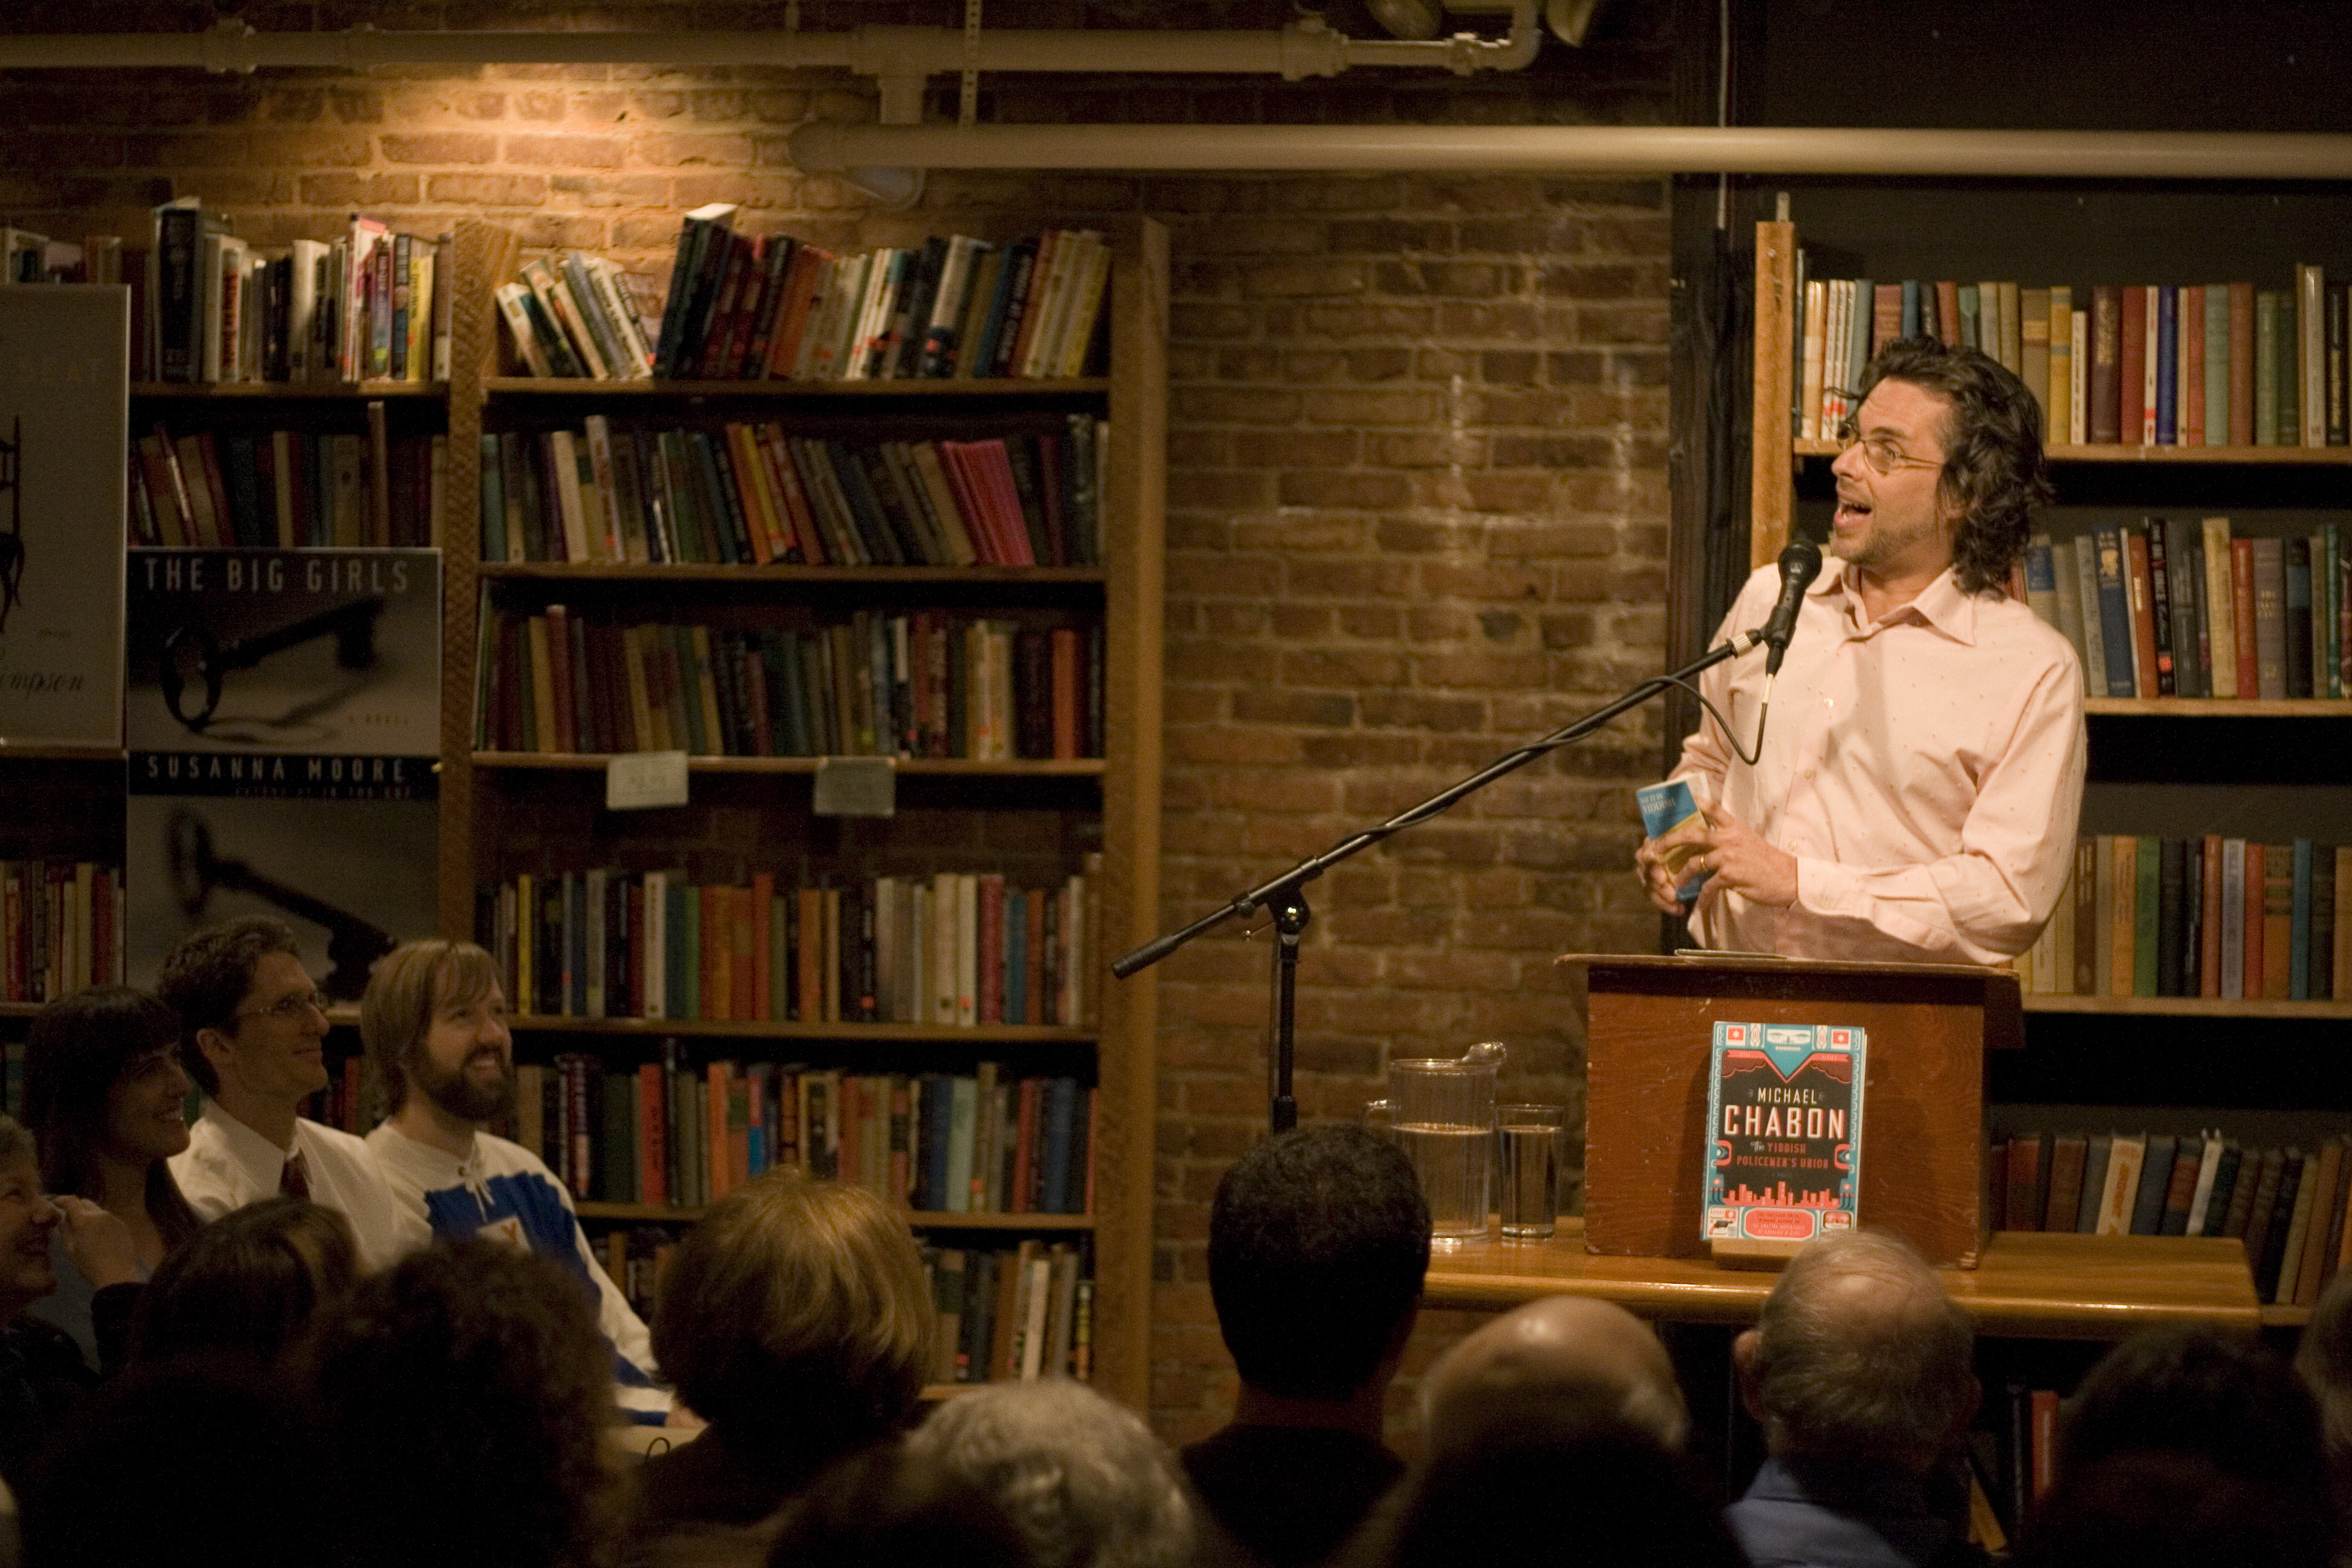 Michael Chabon tijdens een lezing in Seattle (foto:flickr/csb13)